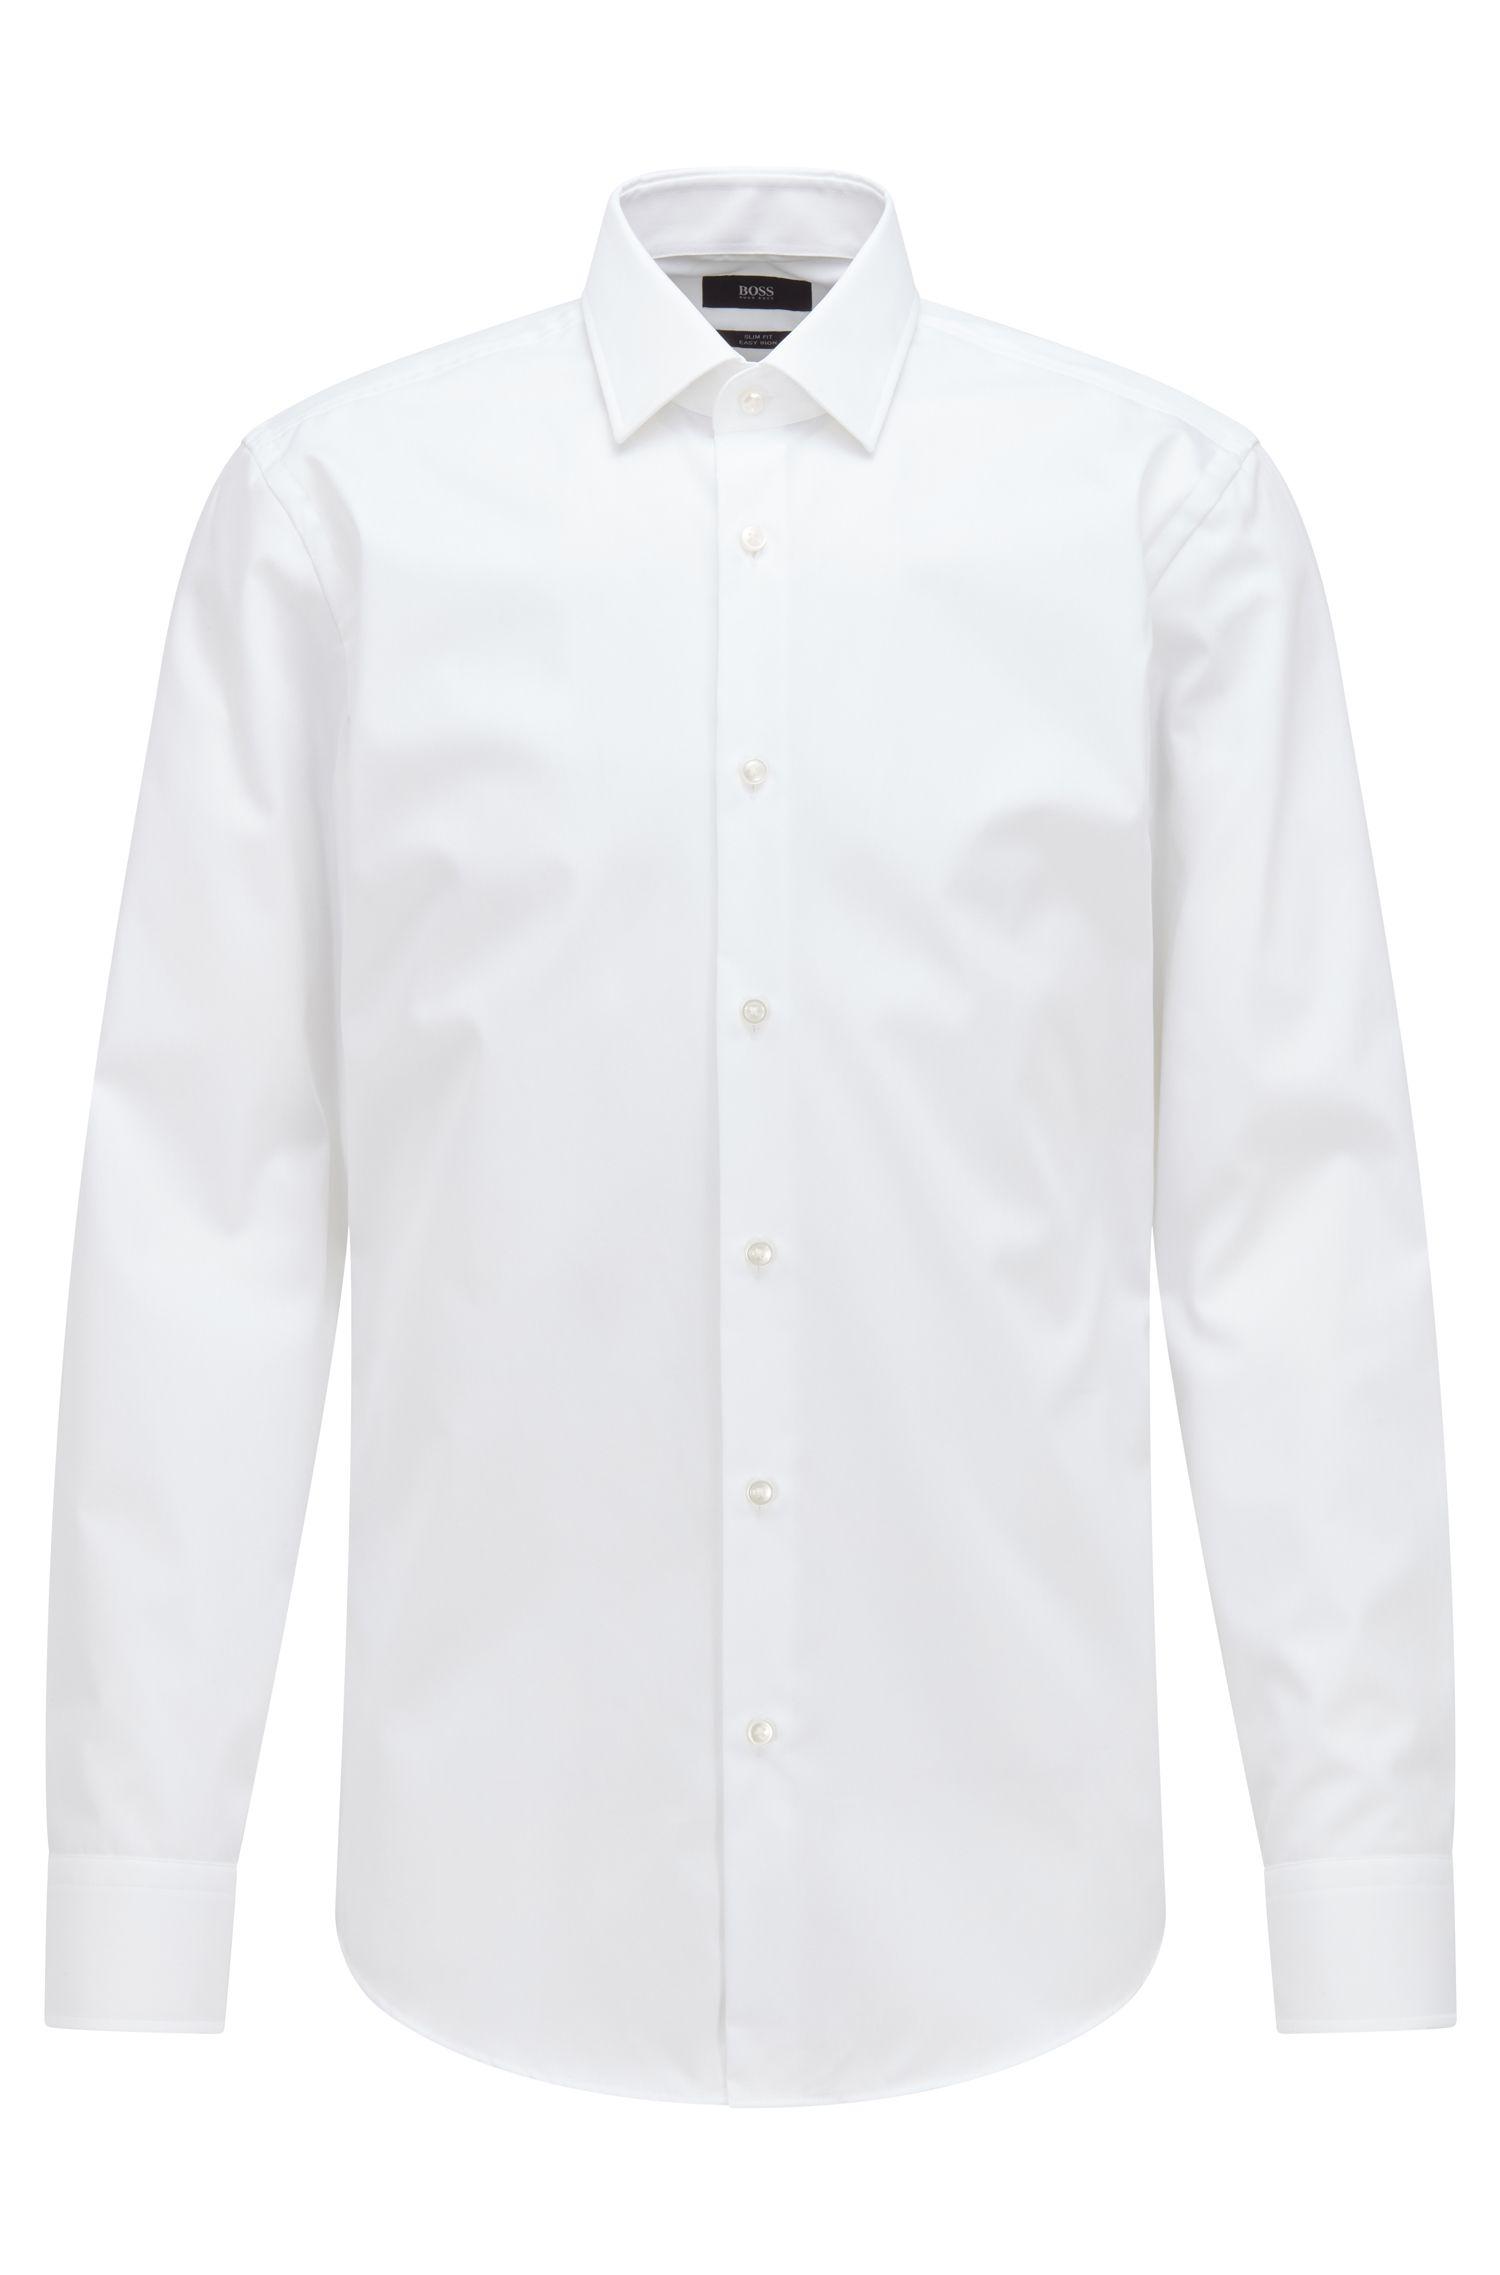 Easy-Iron Italian Cotton Dress Shirt, Slim Fit | Jenno, White